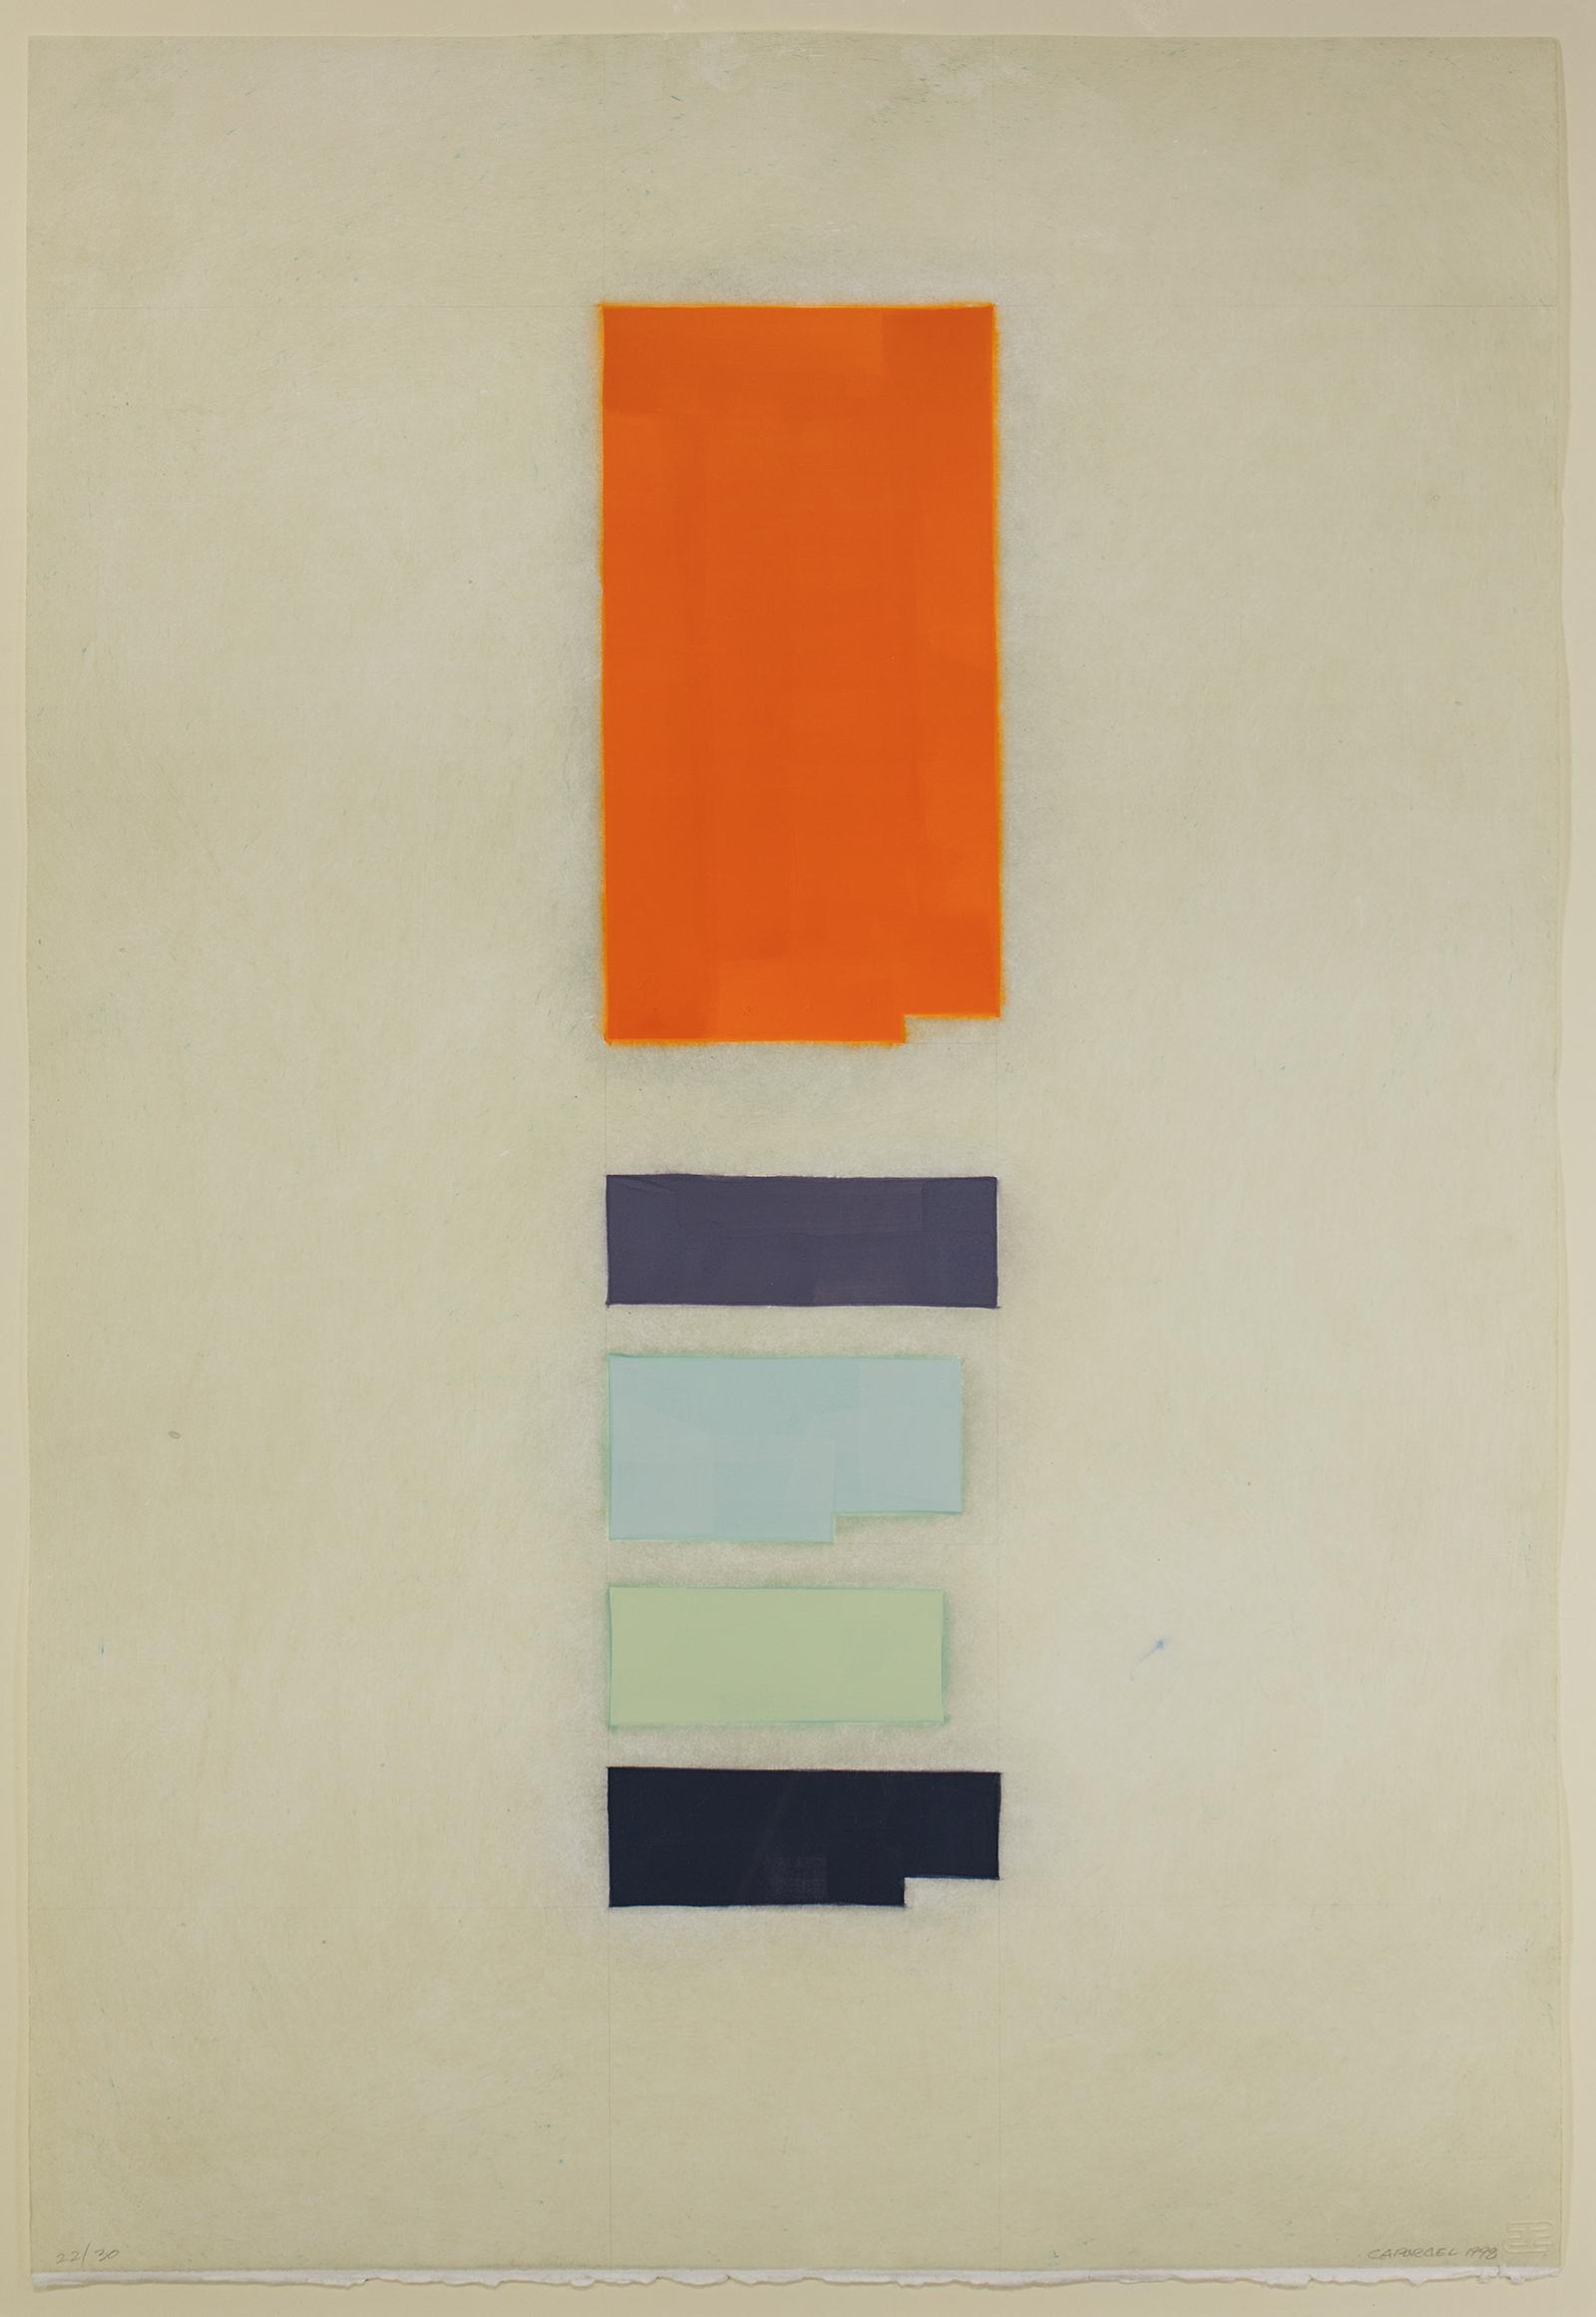 Suzanne Caporael, Chrome Orange: Cr, O, H, Pb, 1997